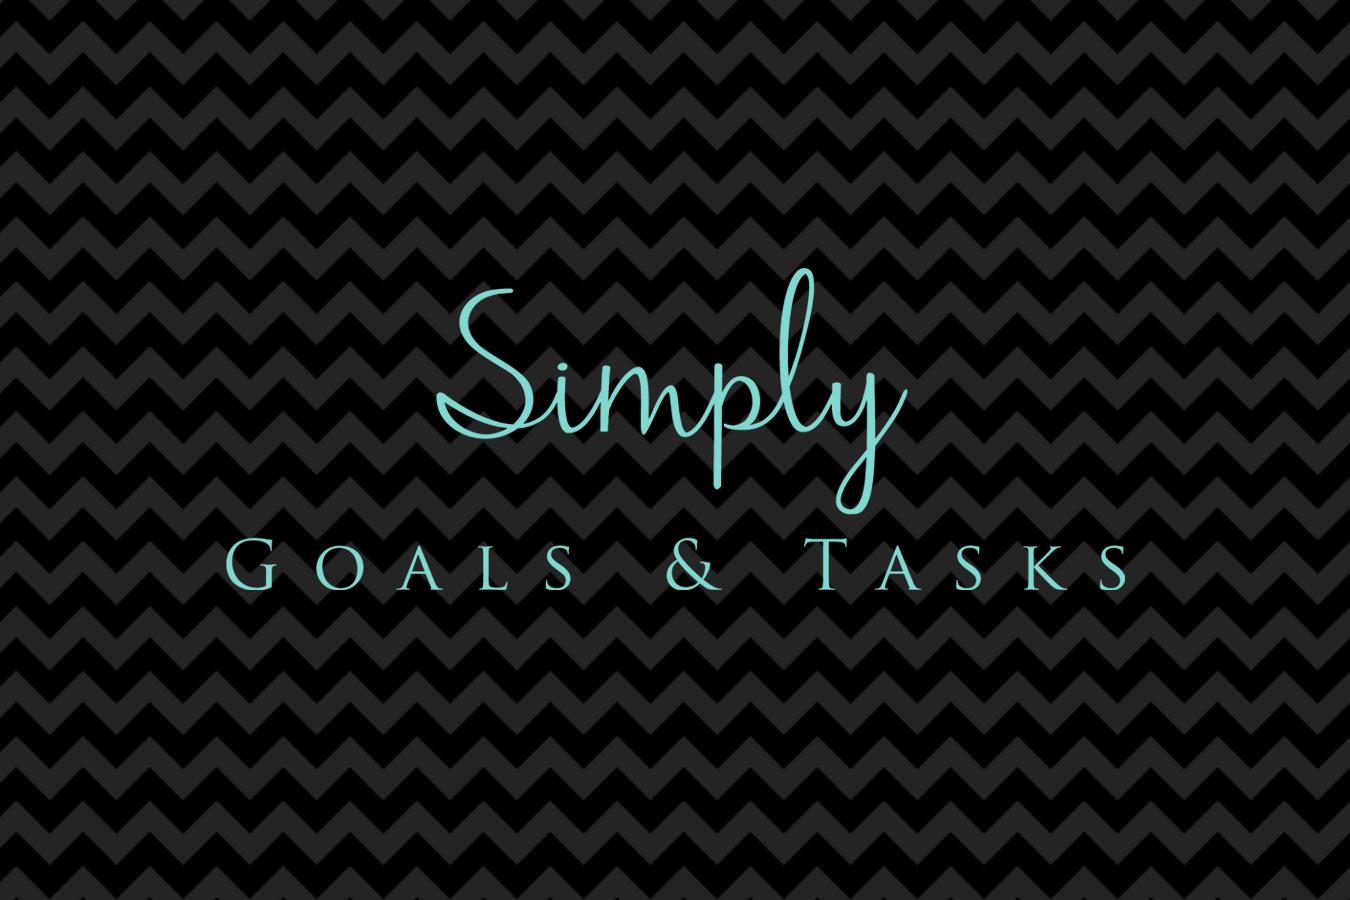 Simply Goals & Tasks